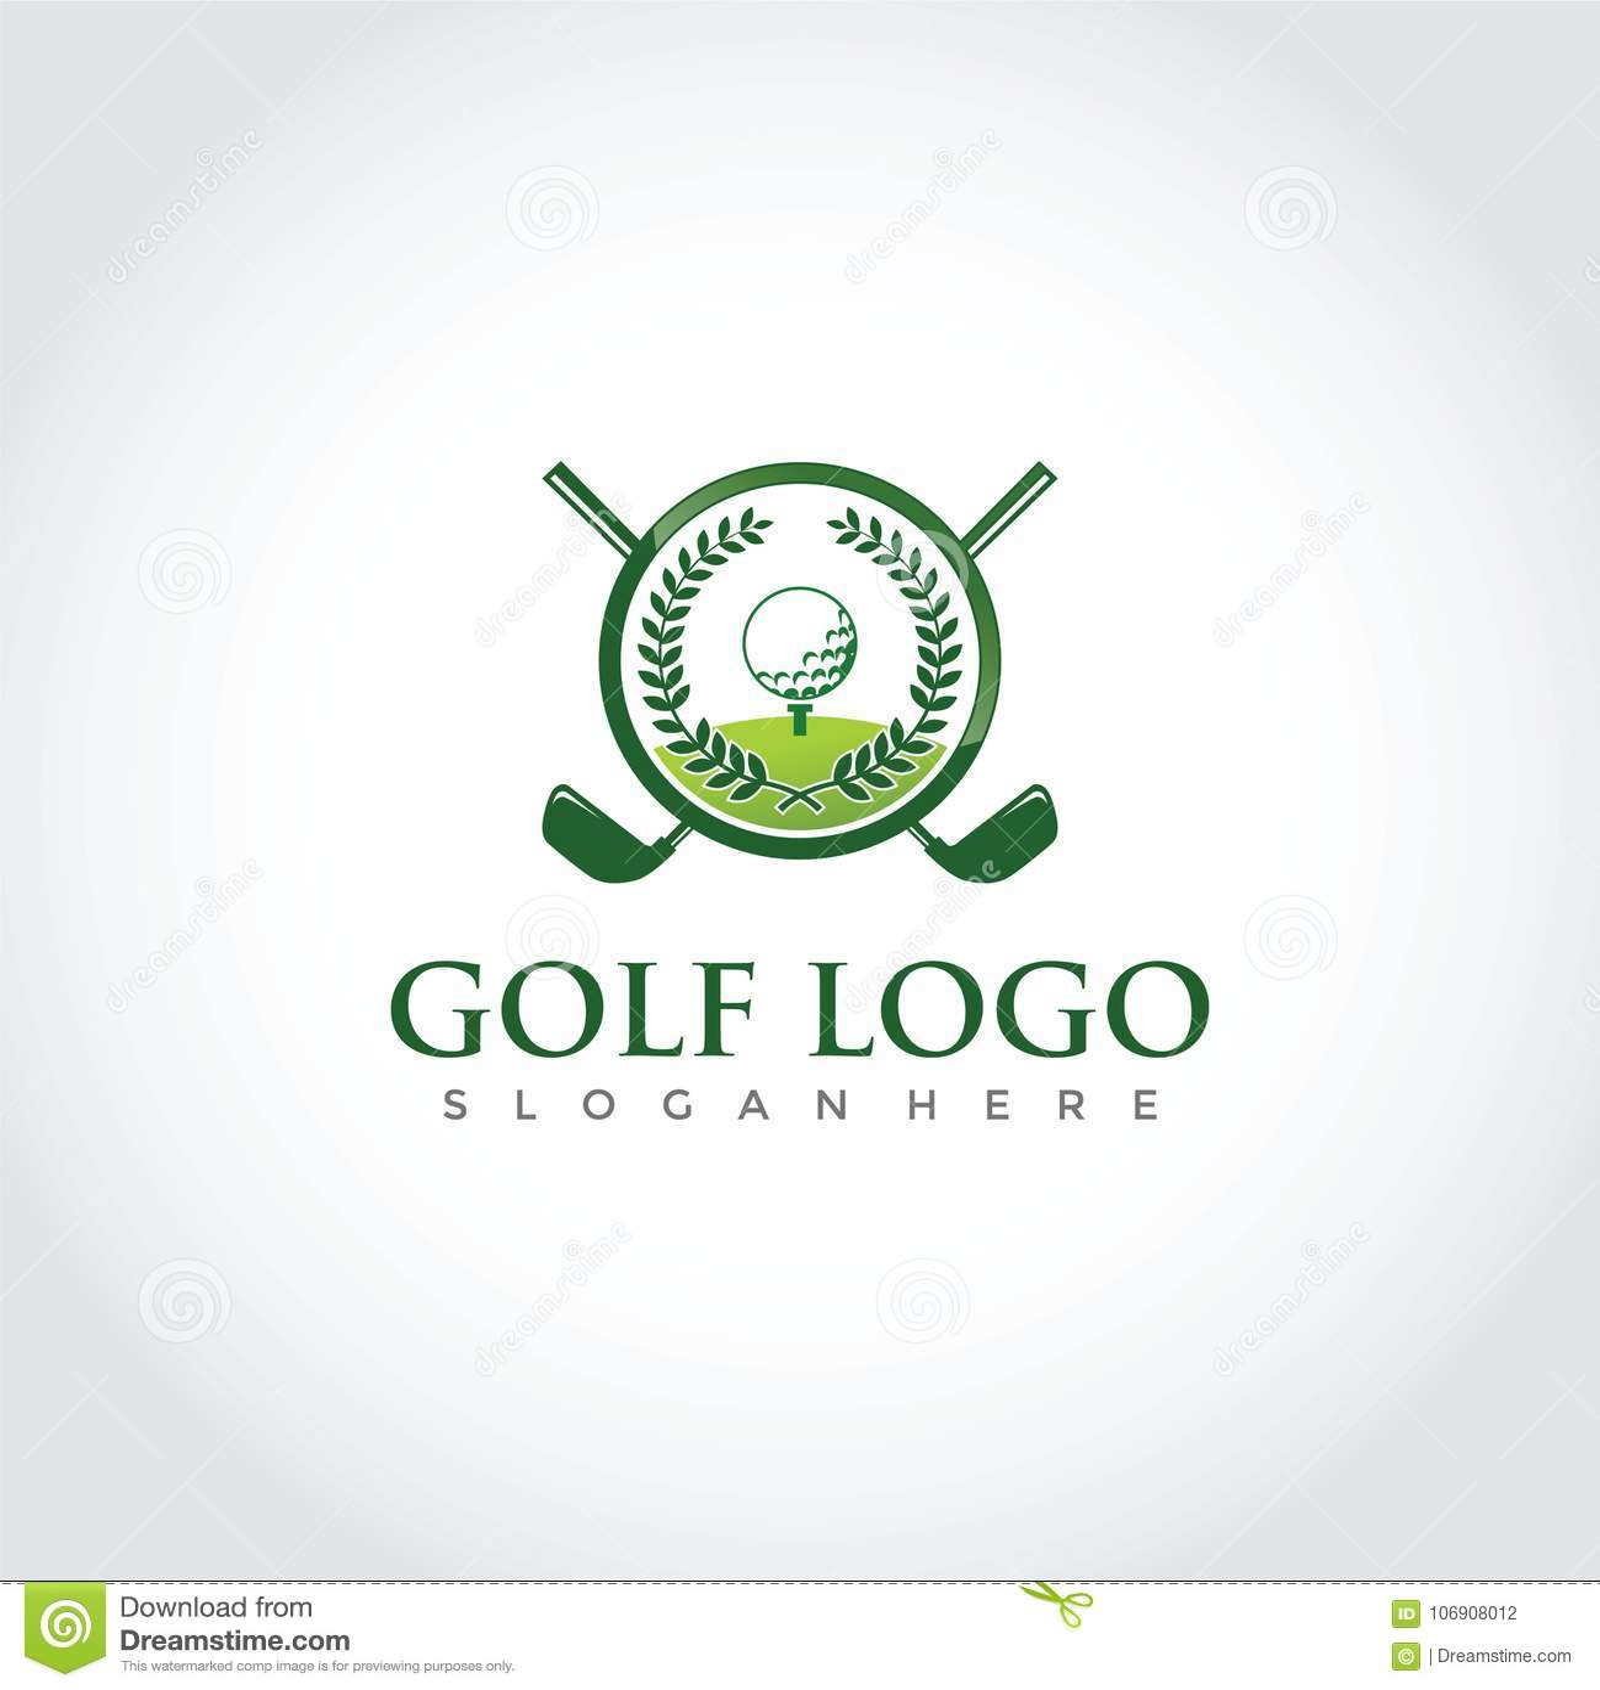 Golf Club Logo Design Vector Illustrator Eps 10 Stock Illustration Illustration Of Champion Green 106908012